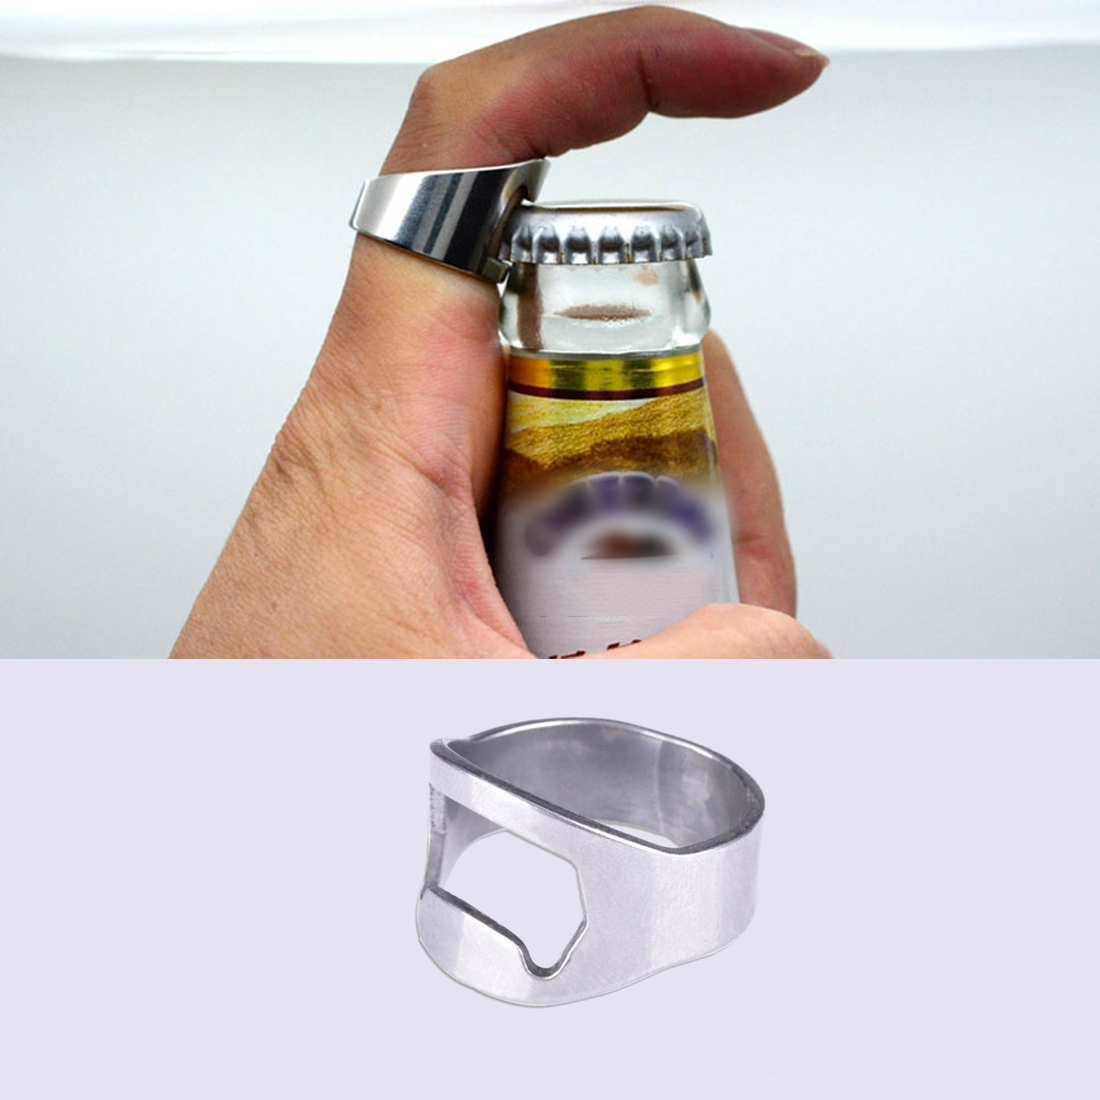 1pc 22mm Unique Creative Versatile Stainless Steel Finger Ring Ring-Shape Beer Bottle Opener Best Gift